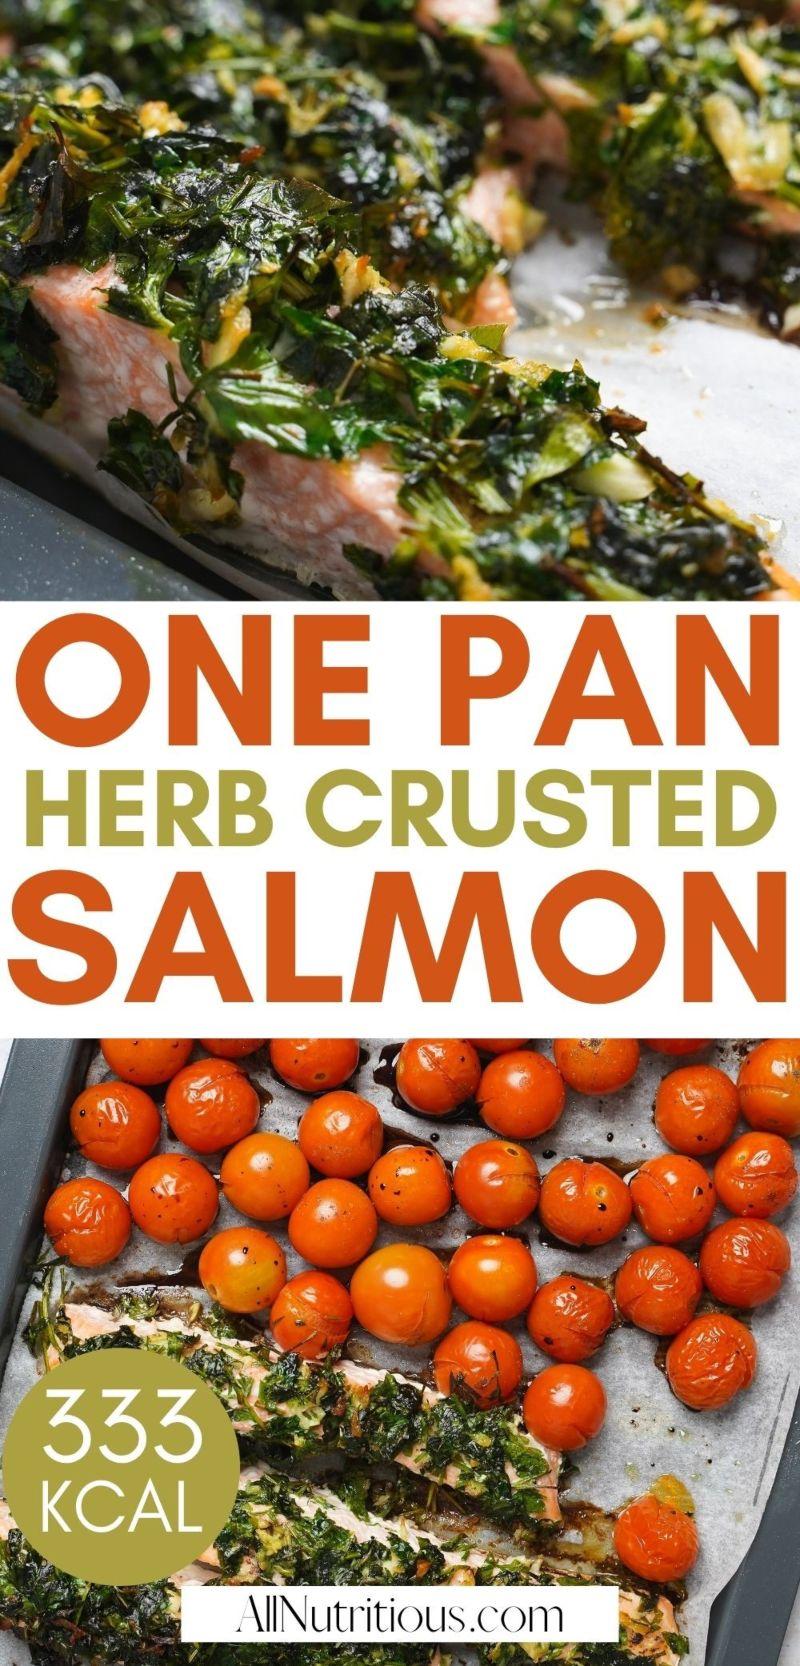 one pan herb crusted salmon